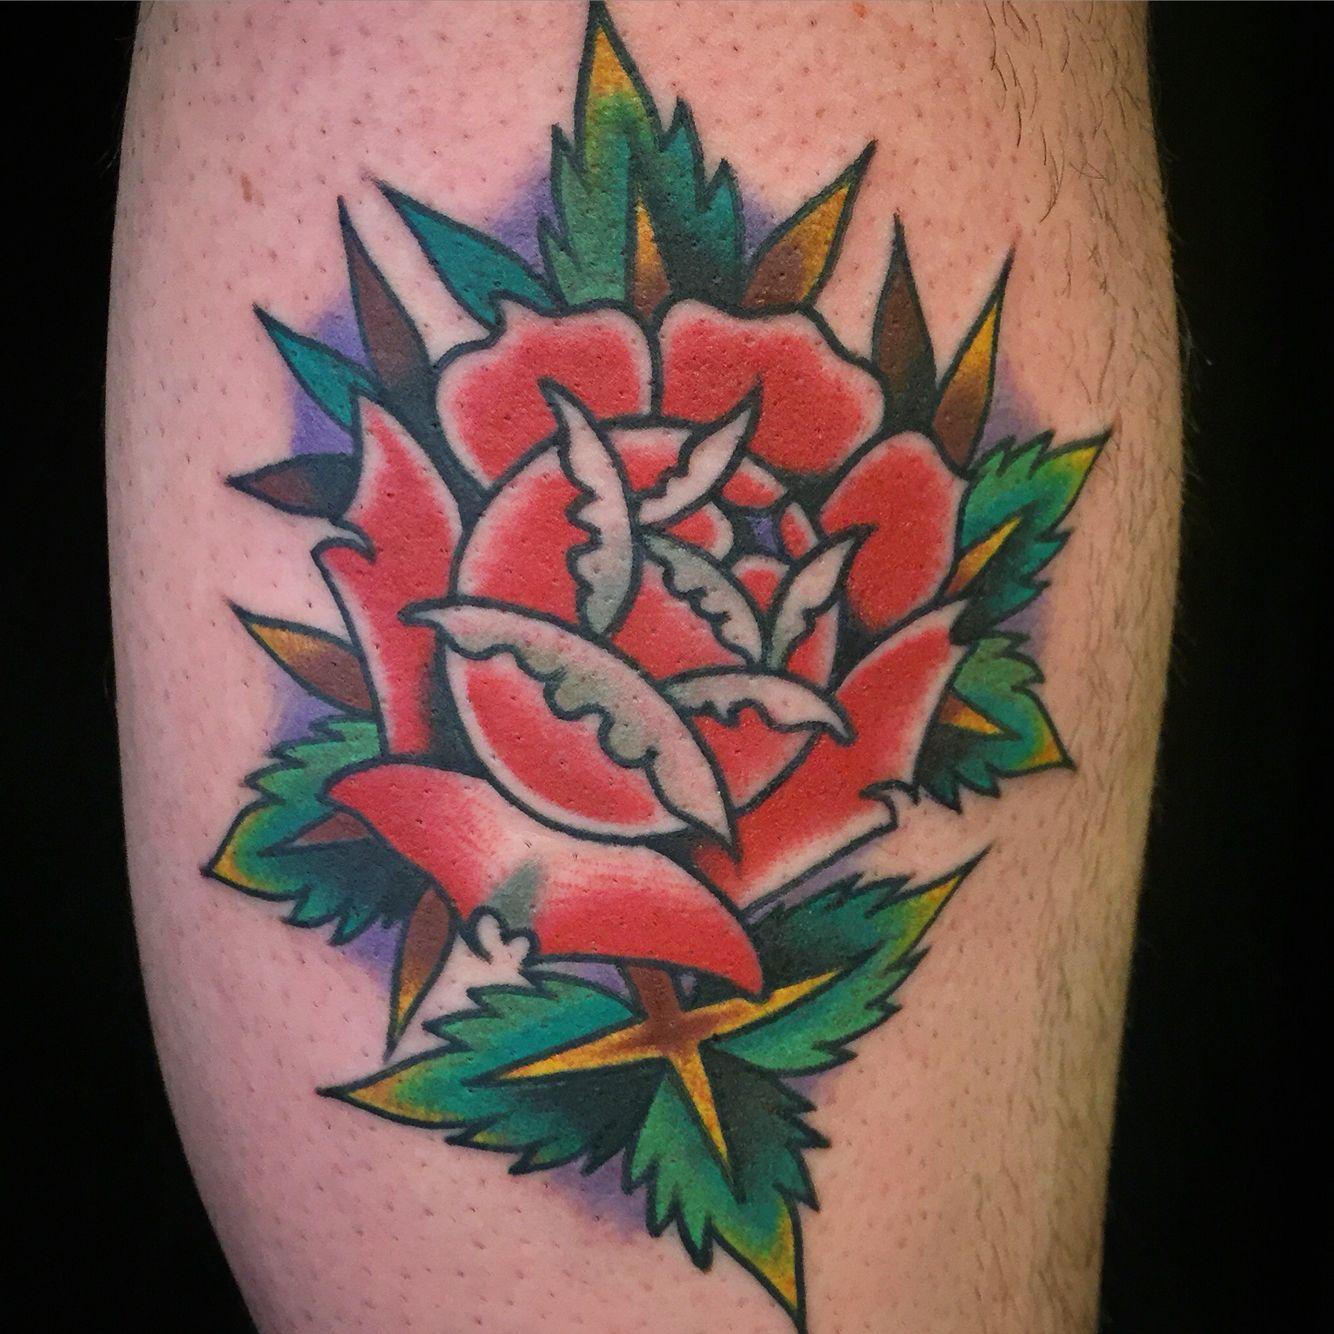 Brandon Kemp Aces Tattoos Denton Texas Instagram Brandonkemptattoo Ace Tattoo Tattoos Kemp